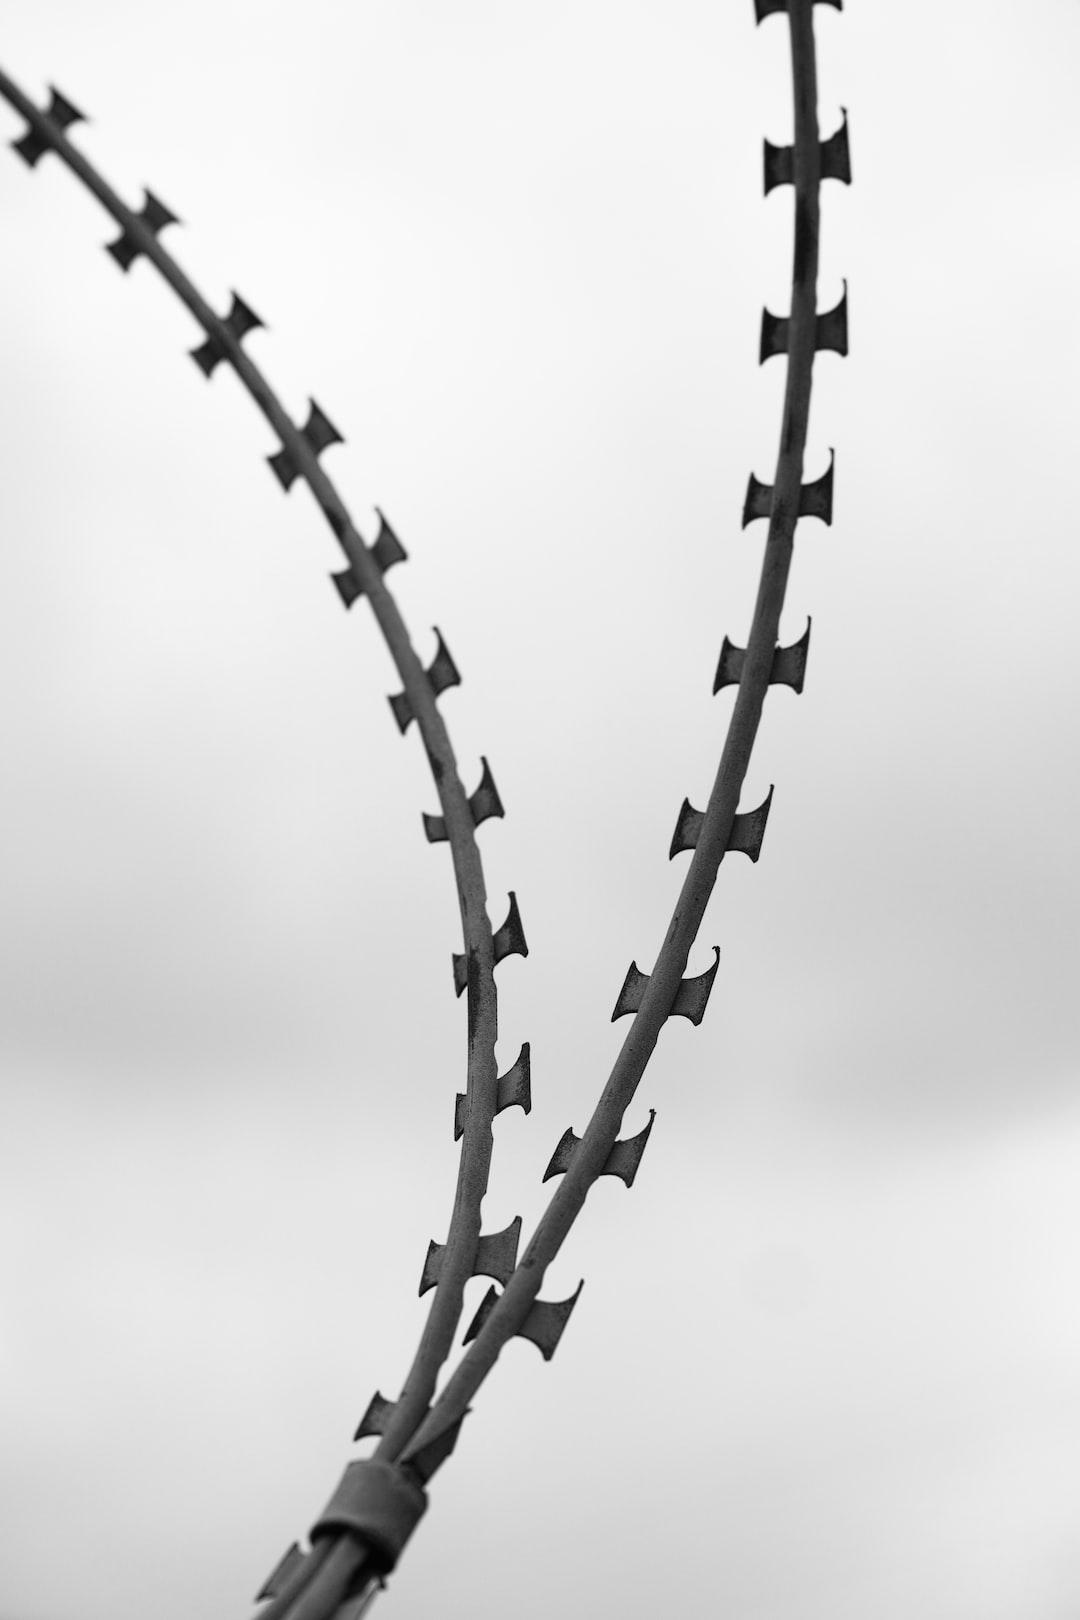 sharp barbed wire